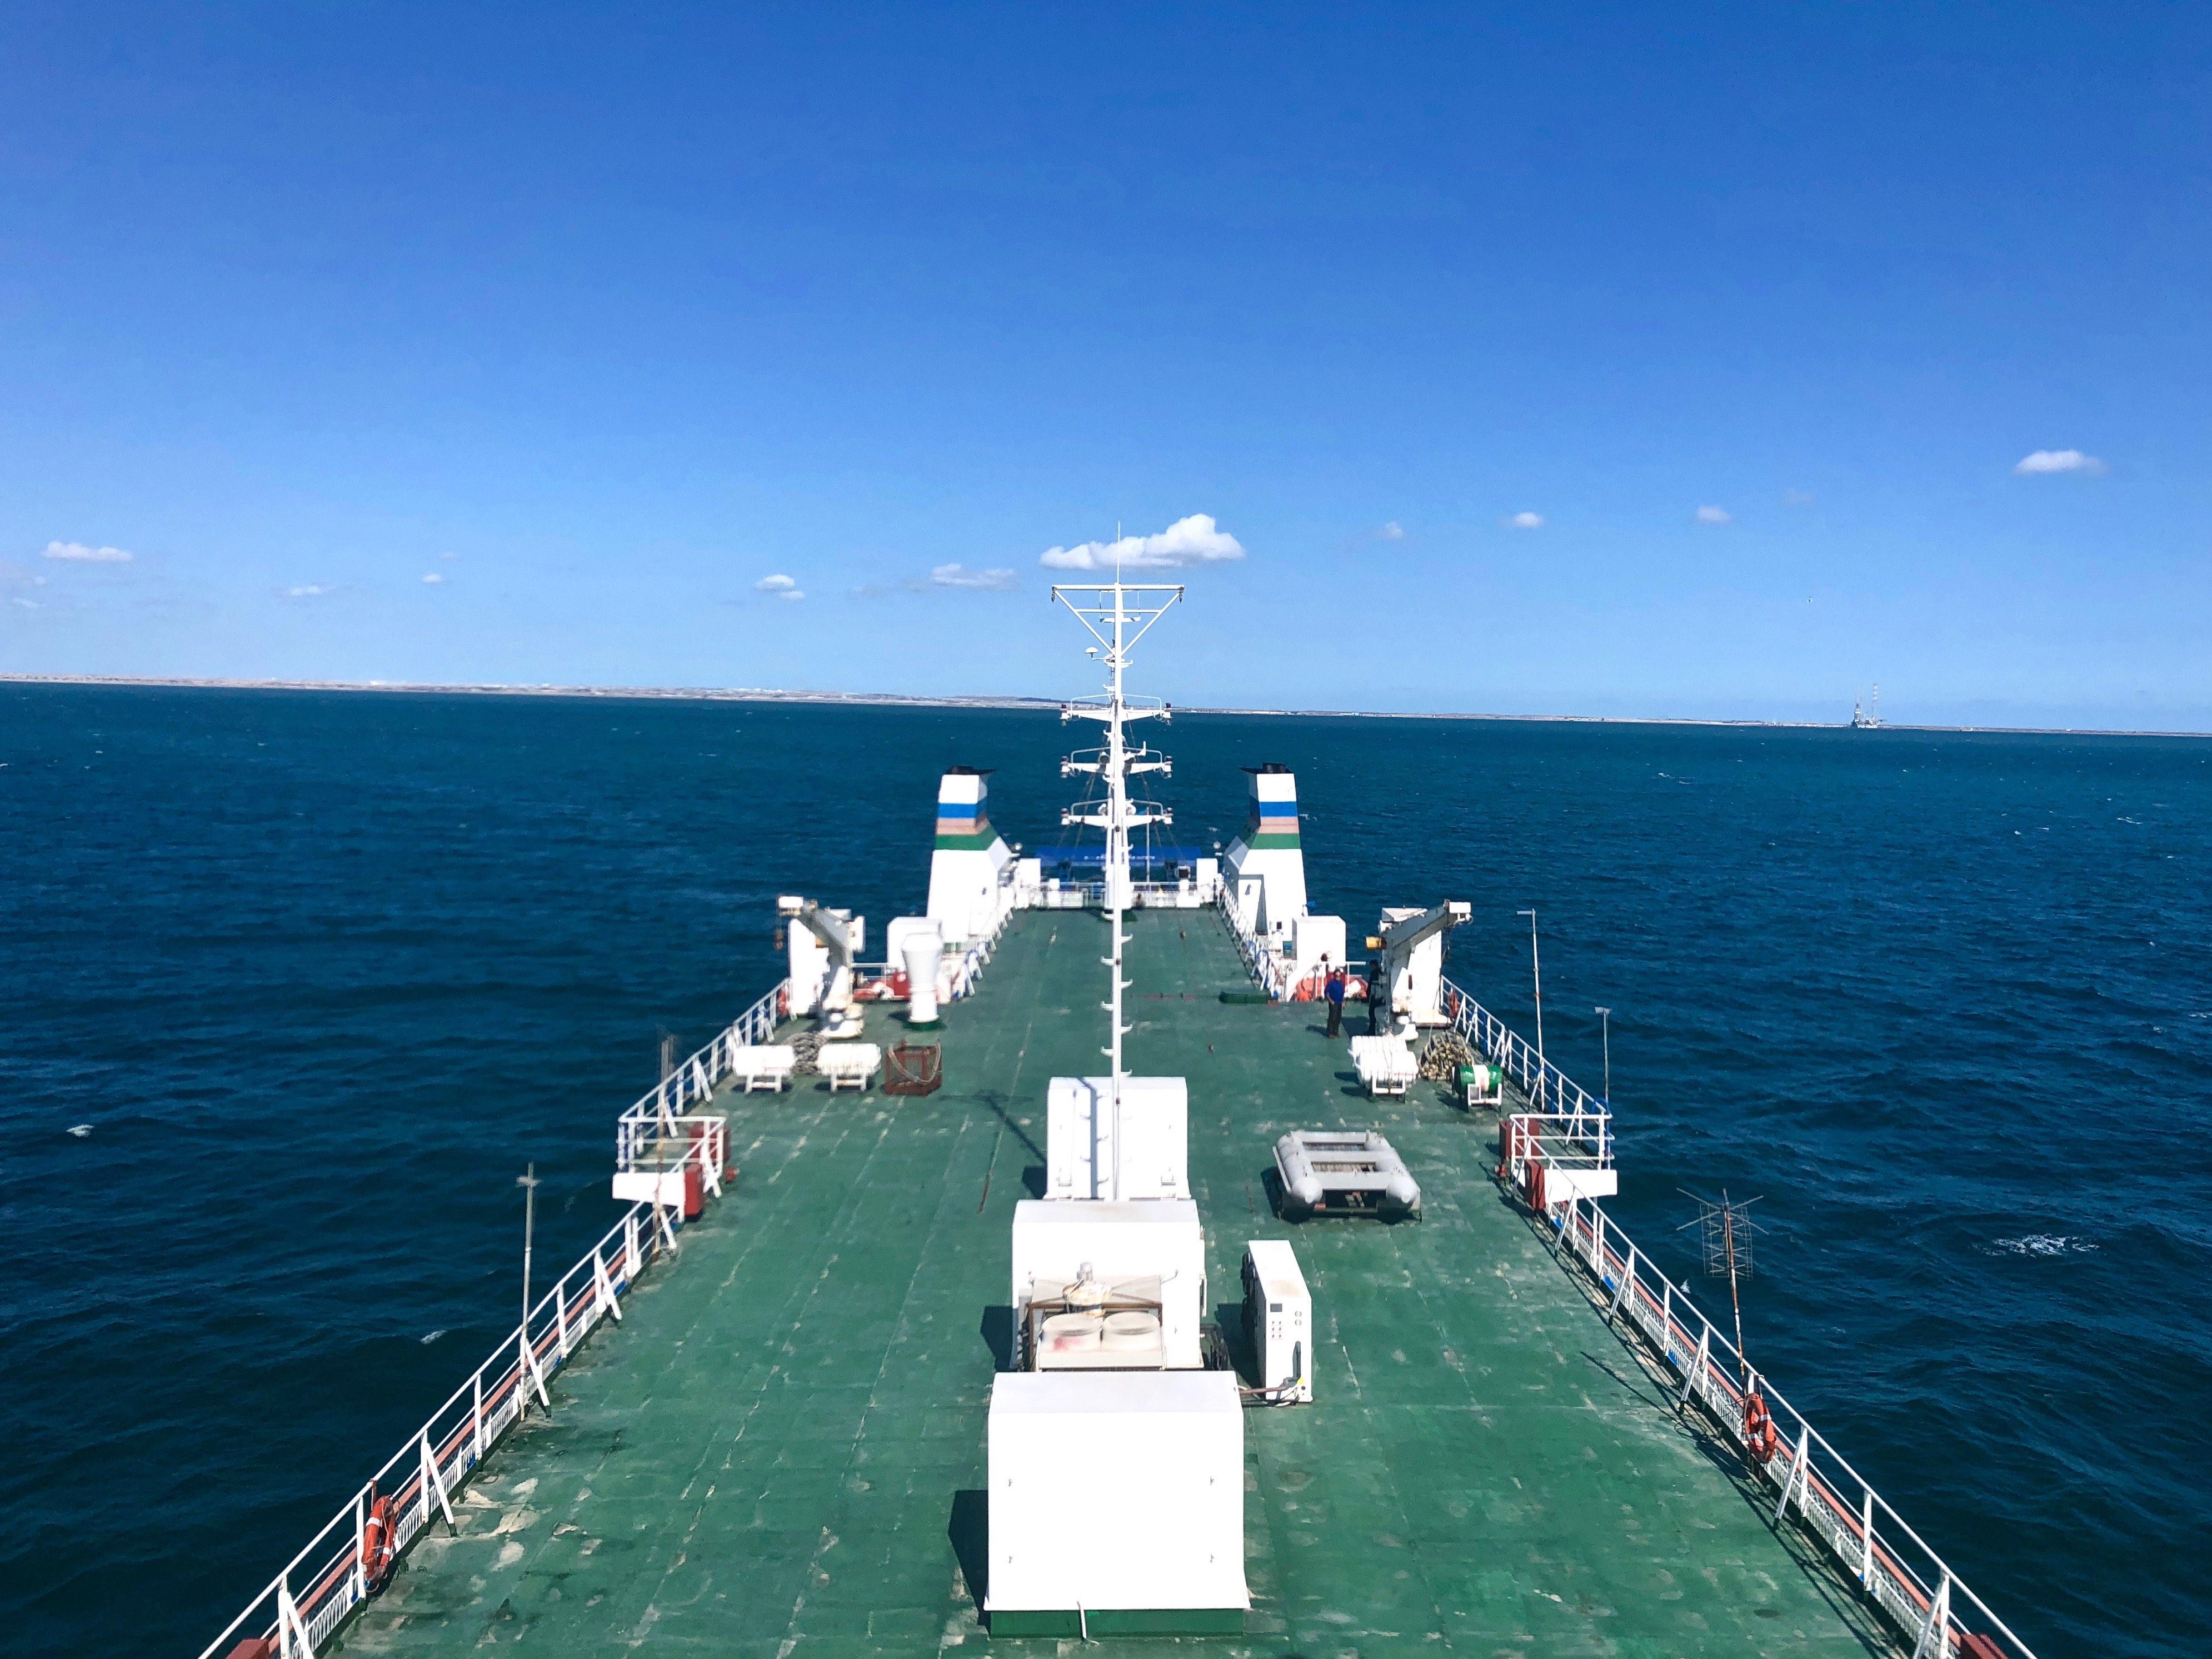 Crossing The Caspian